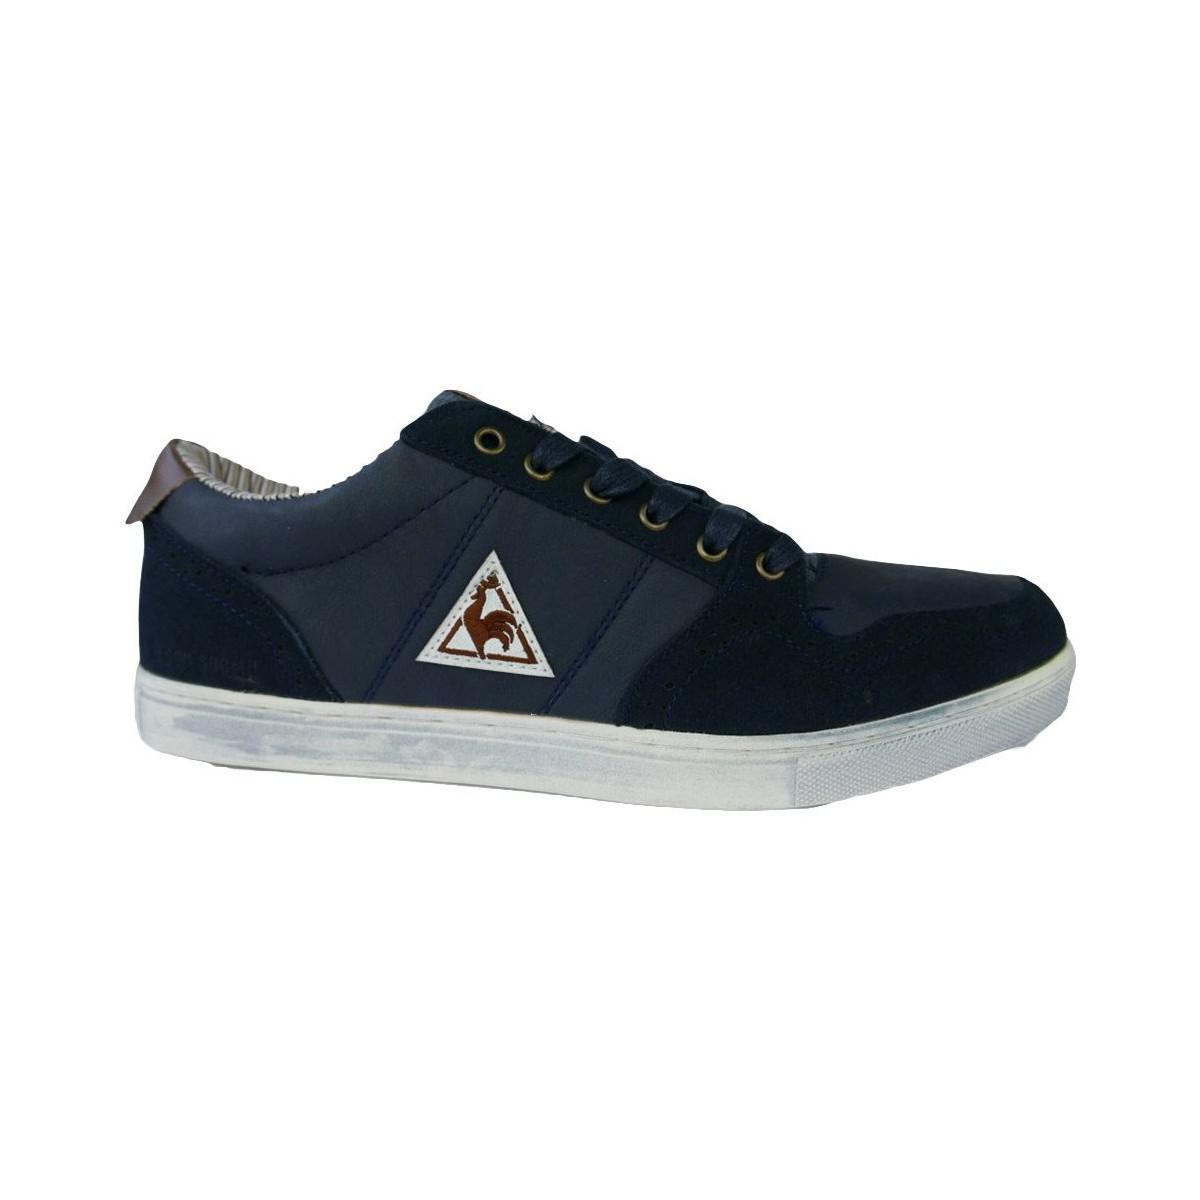 c5fd682d3933 Le Coq Sportif Bronne Low Sr Men s Shoes (trainers) In Black in ...